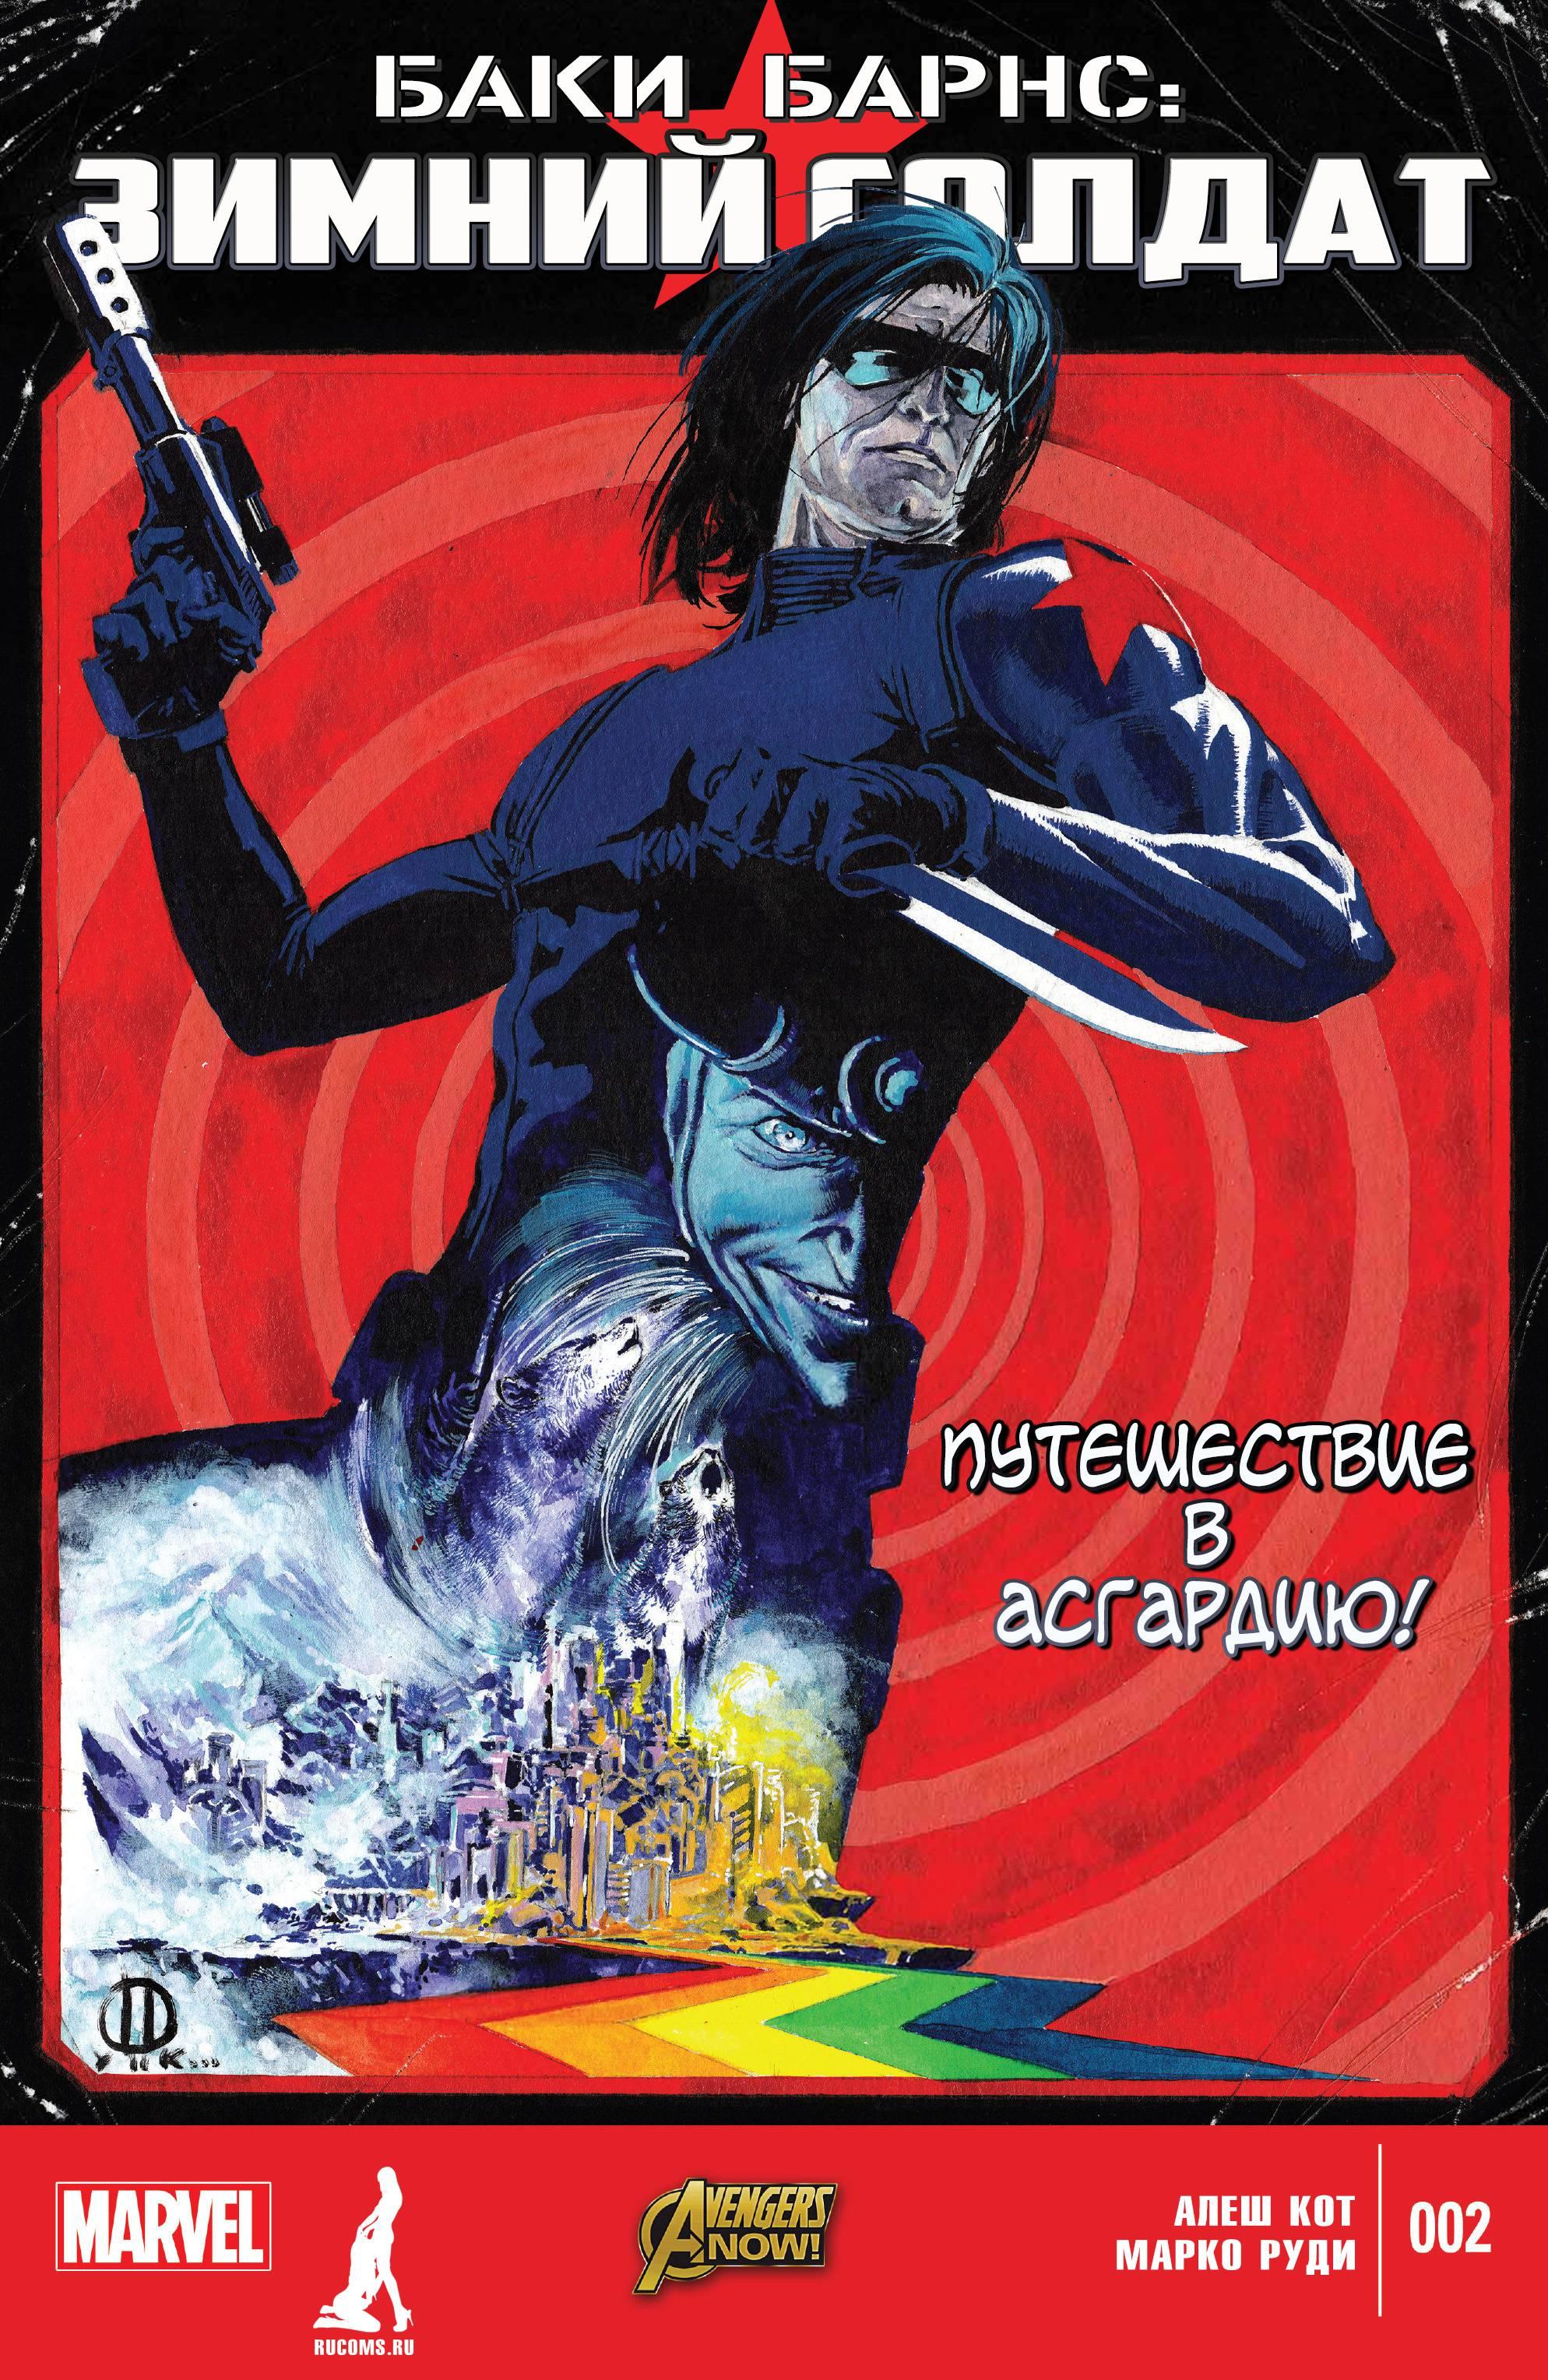 Баки Барнс: Зимний Солдат №2 онлайн